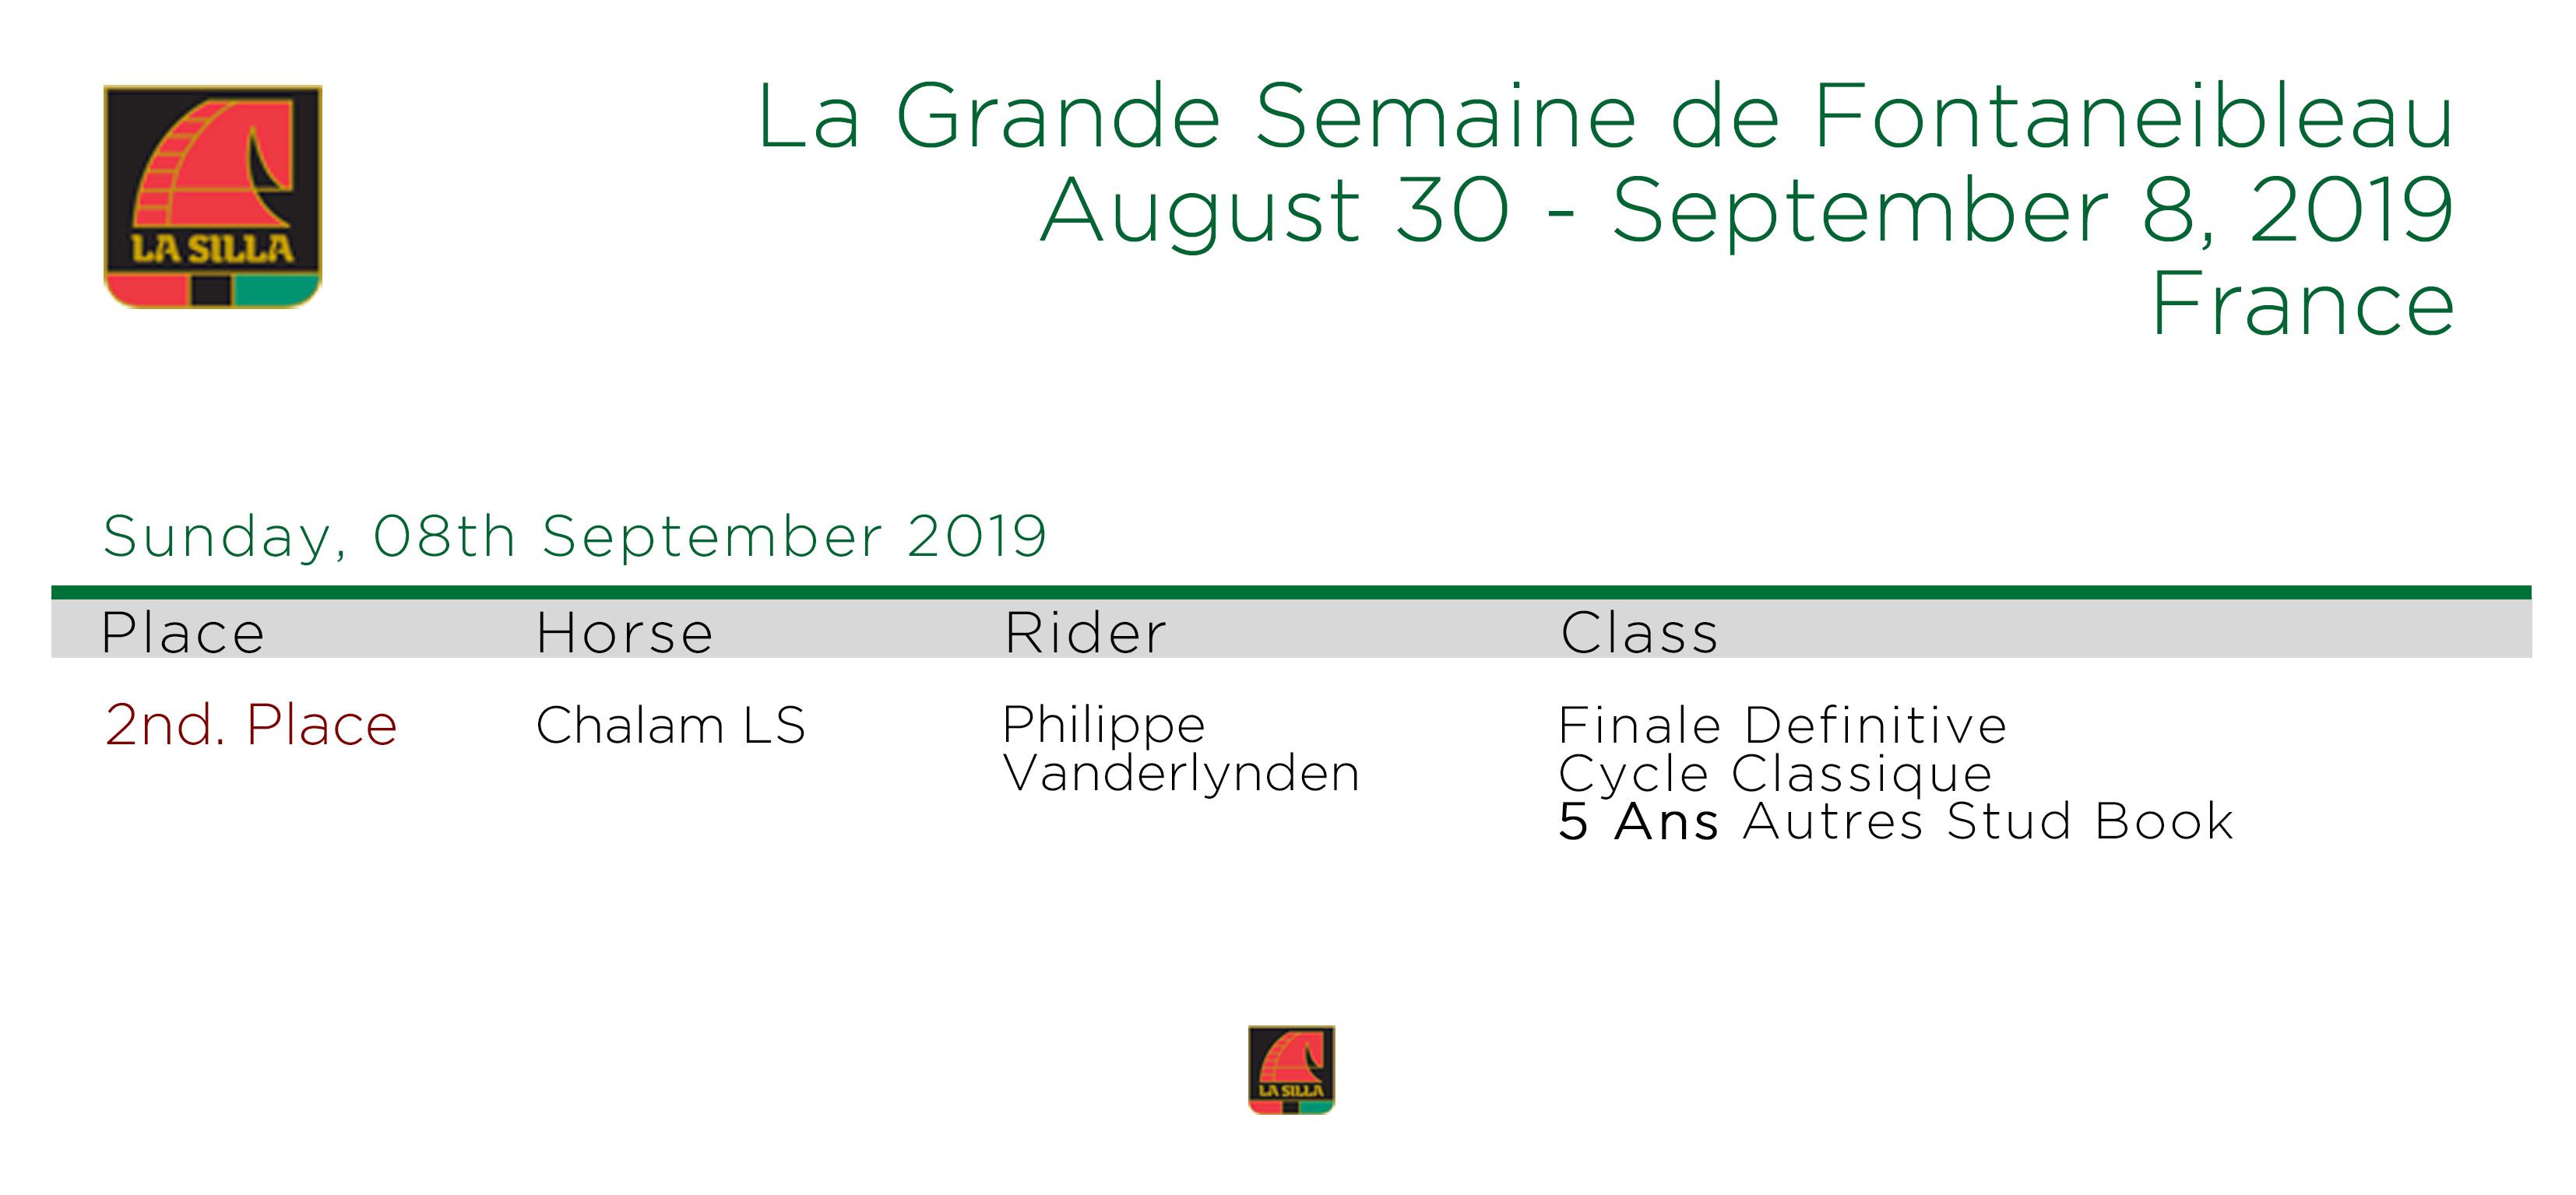 La-Grande-Semaine-de-Fontaneibleau-Sept-2019